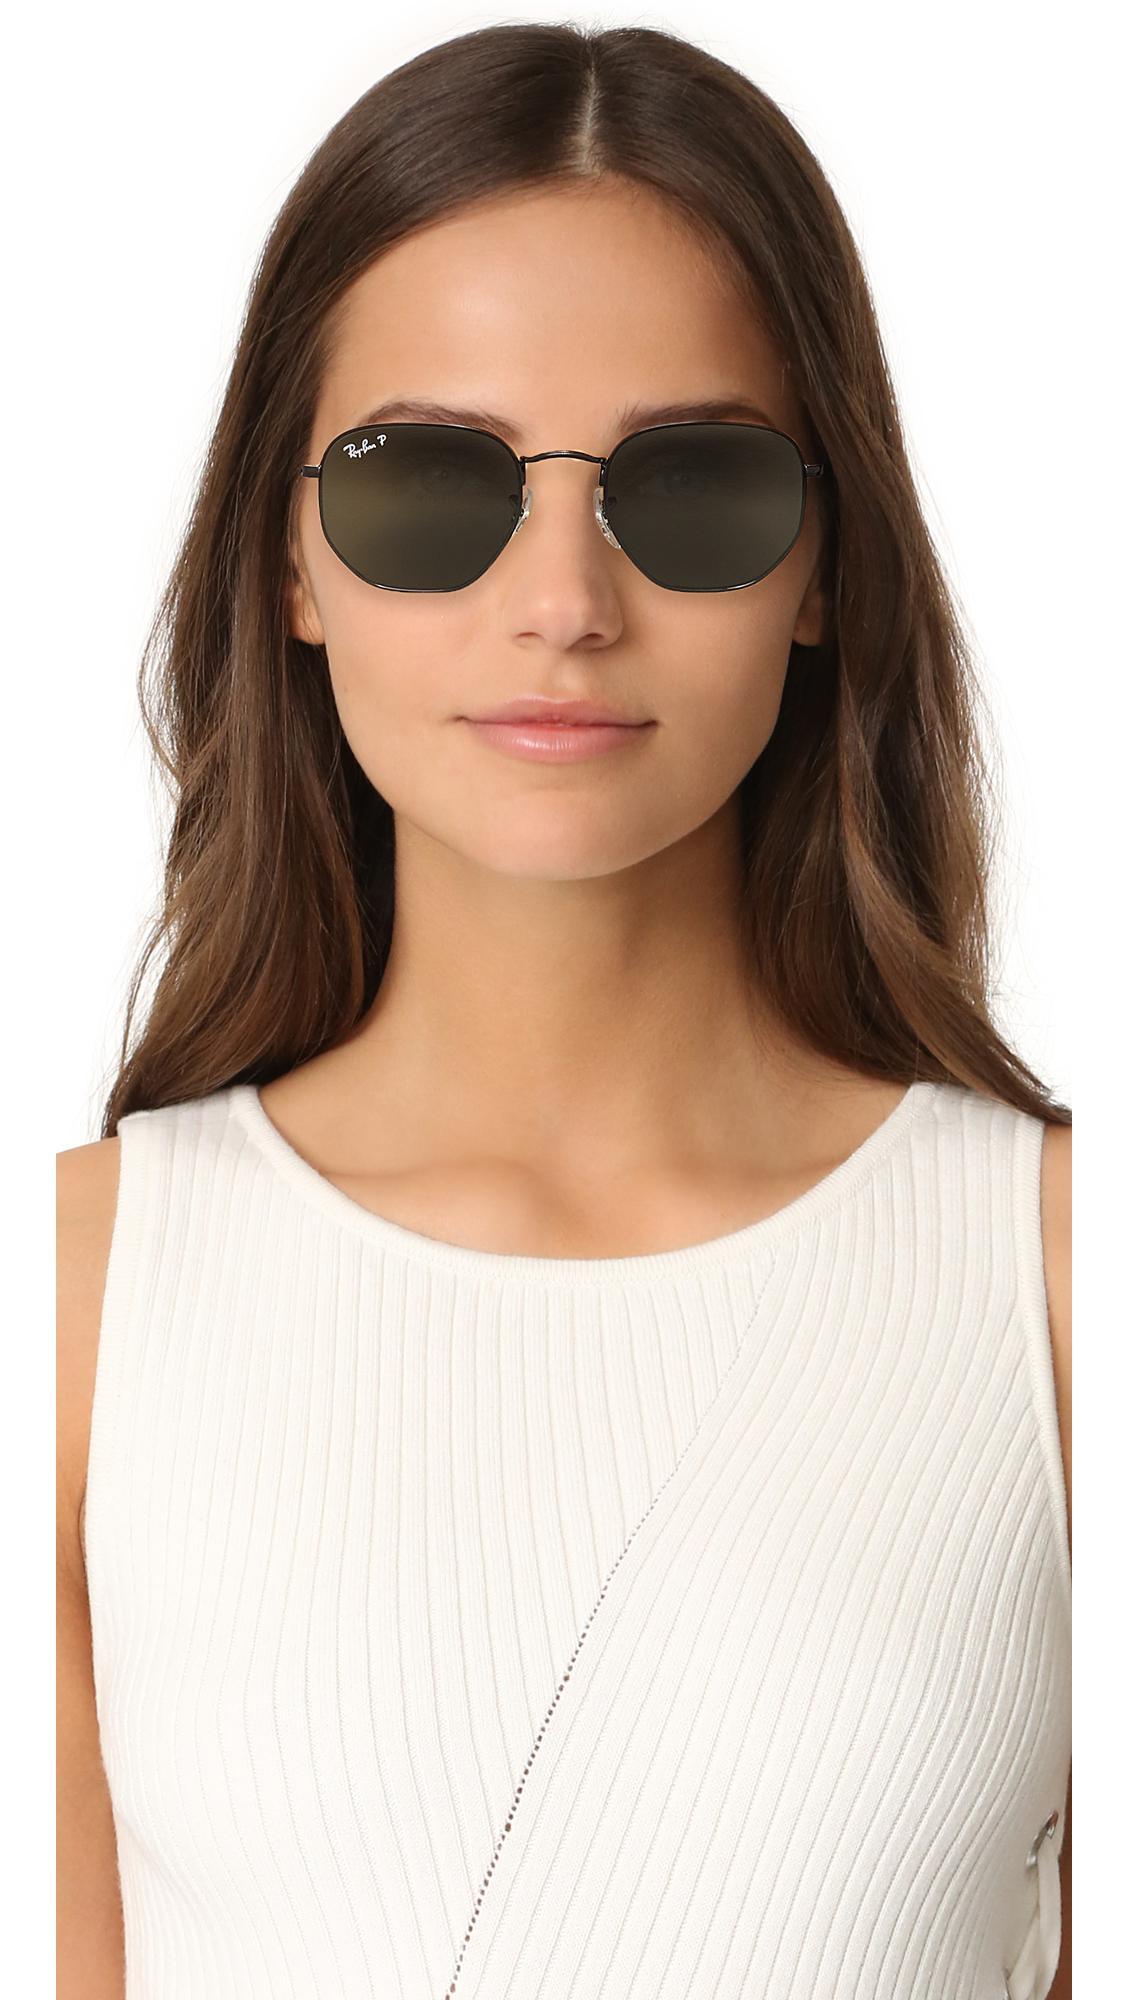 8355ef5aed ... promo code for ray ban gray polarized hexagonal sunglasses lyst. view  fullscreen 68259 0fdb3